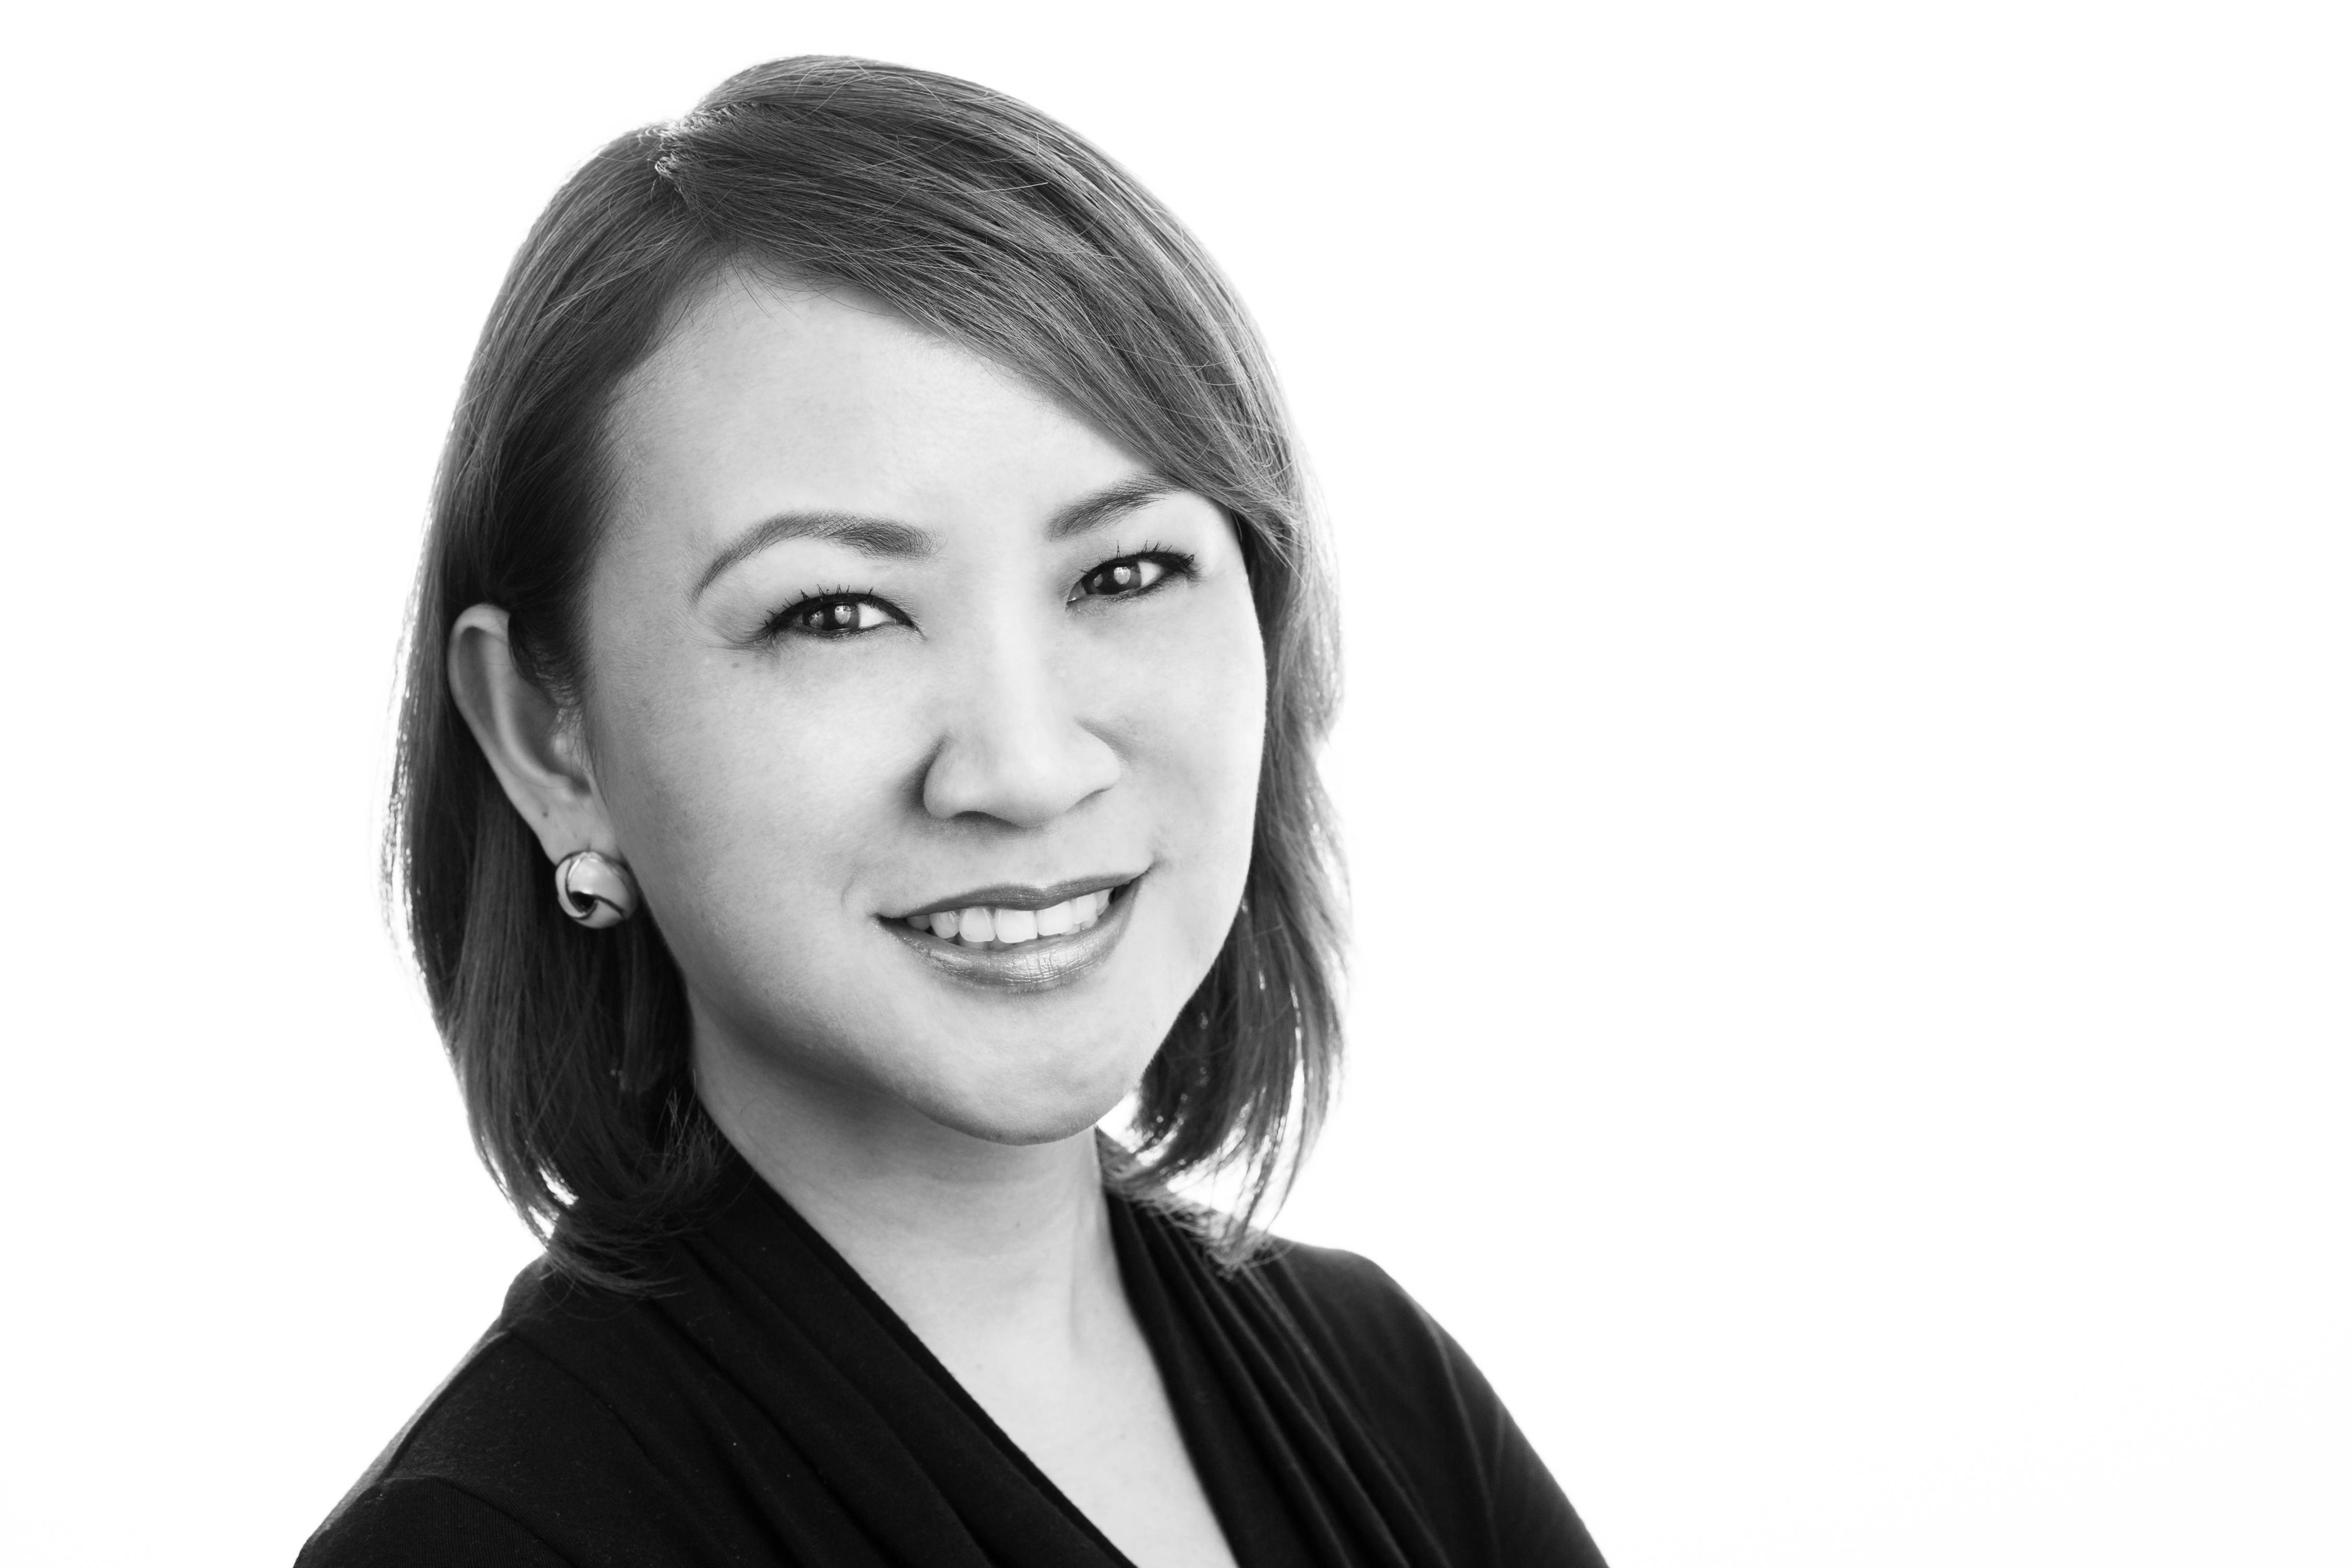 Corporate headshot joyce yung productions